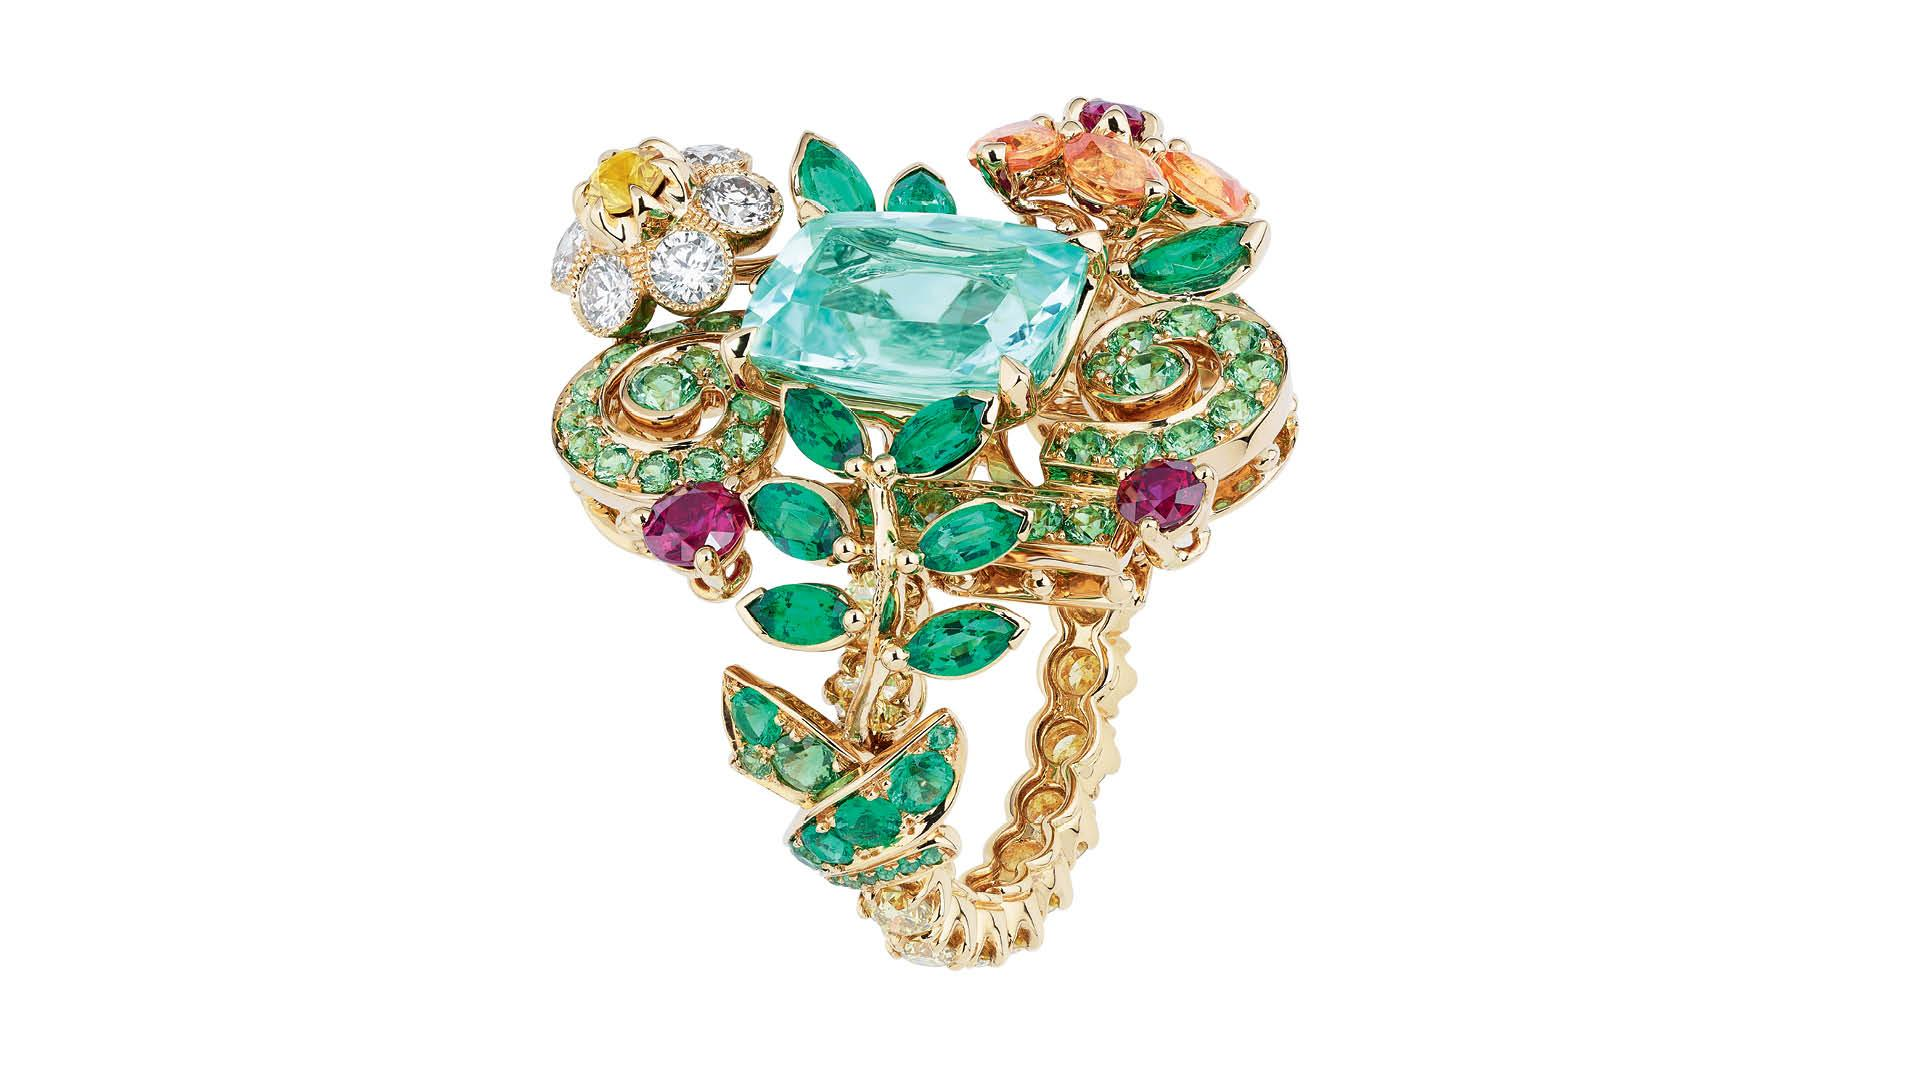 Dior Cote Jardin Paraiba Tourmaline Ring